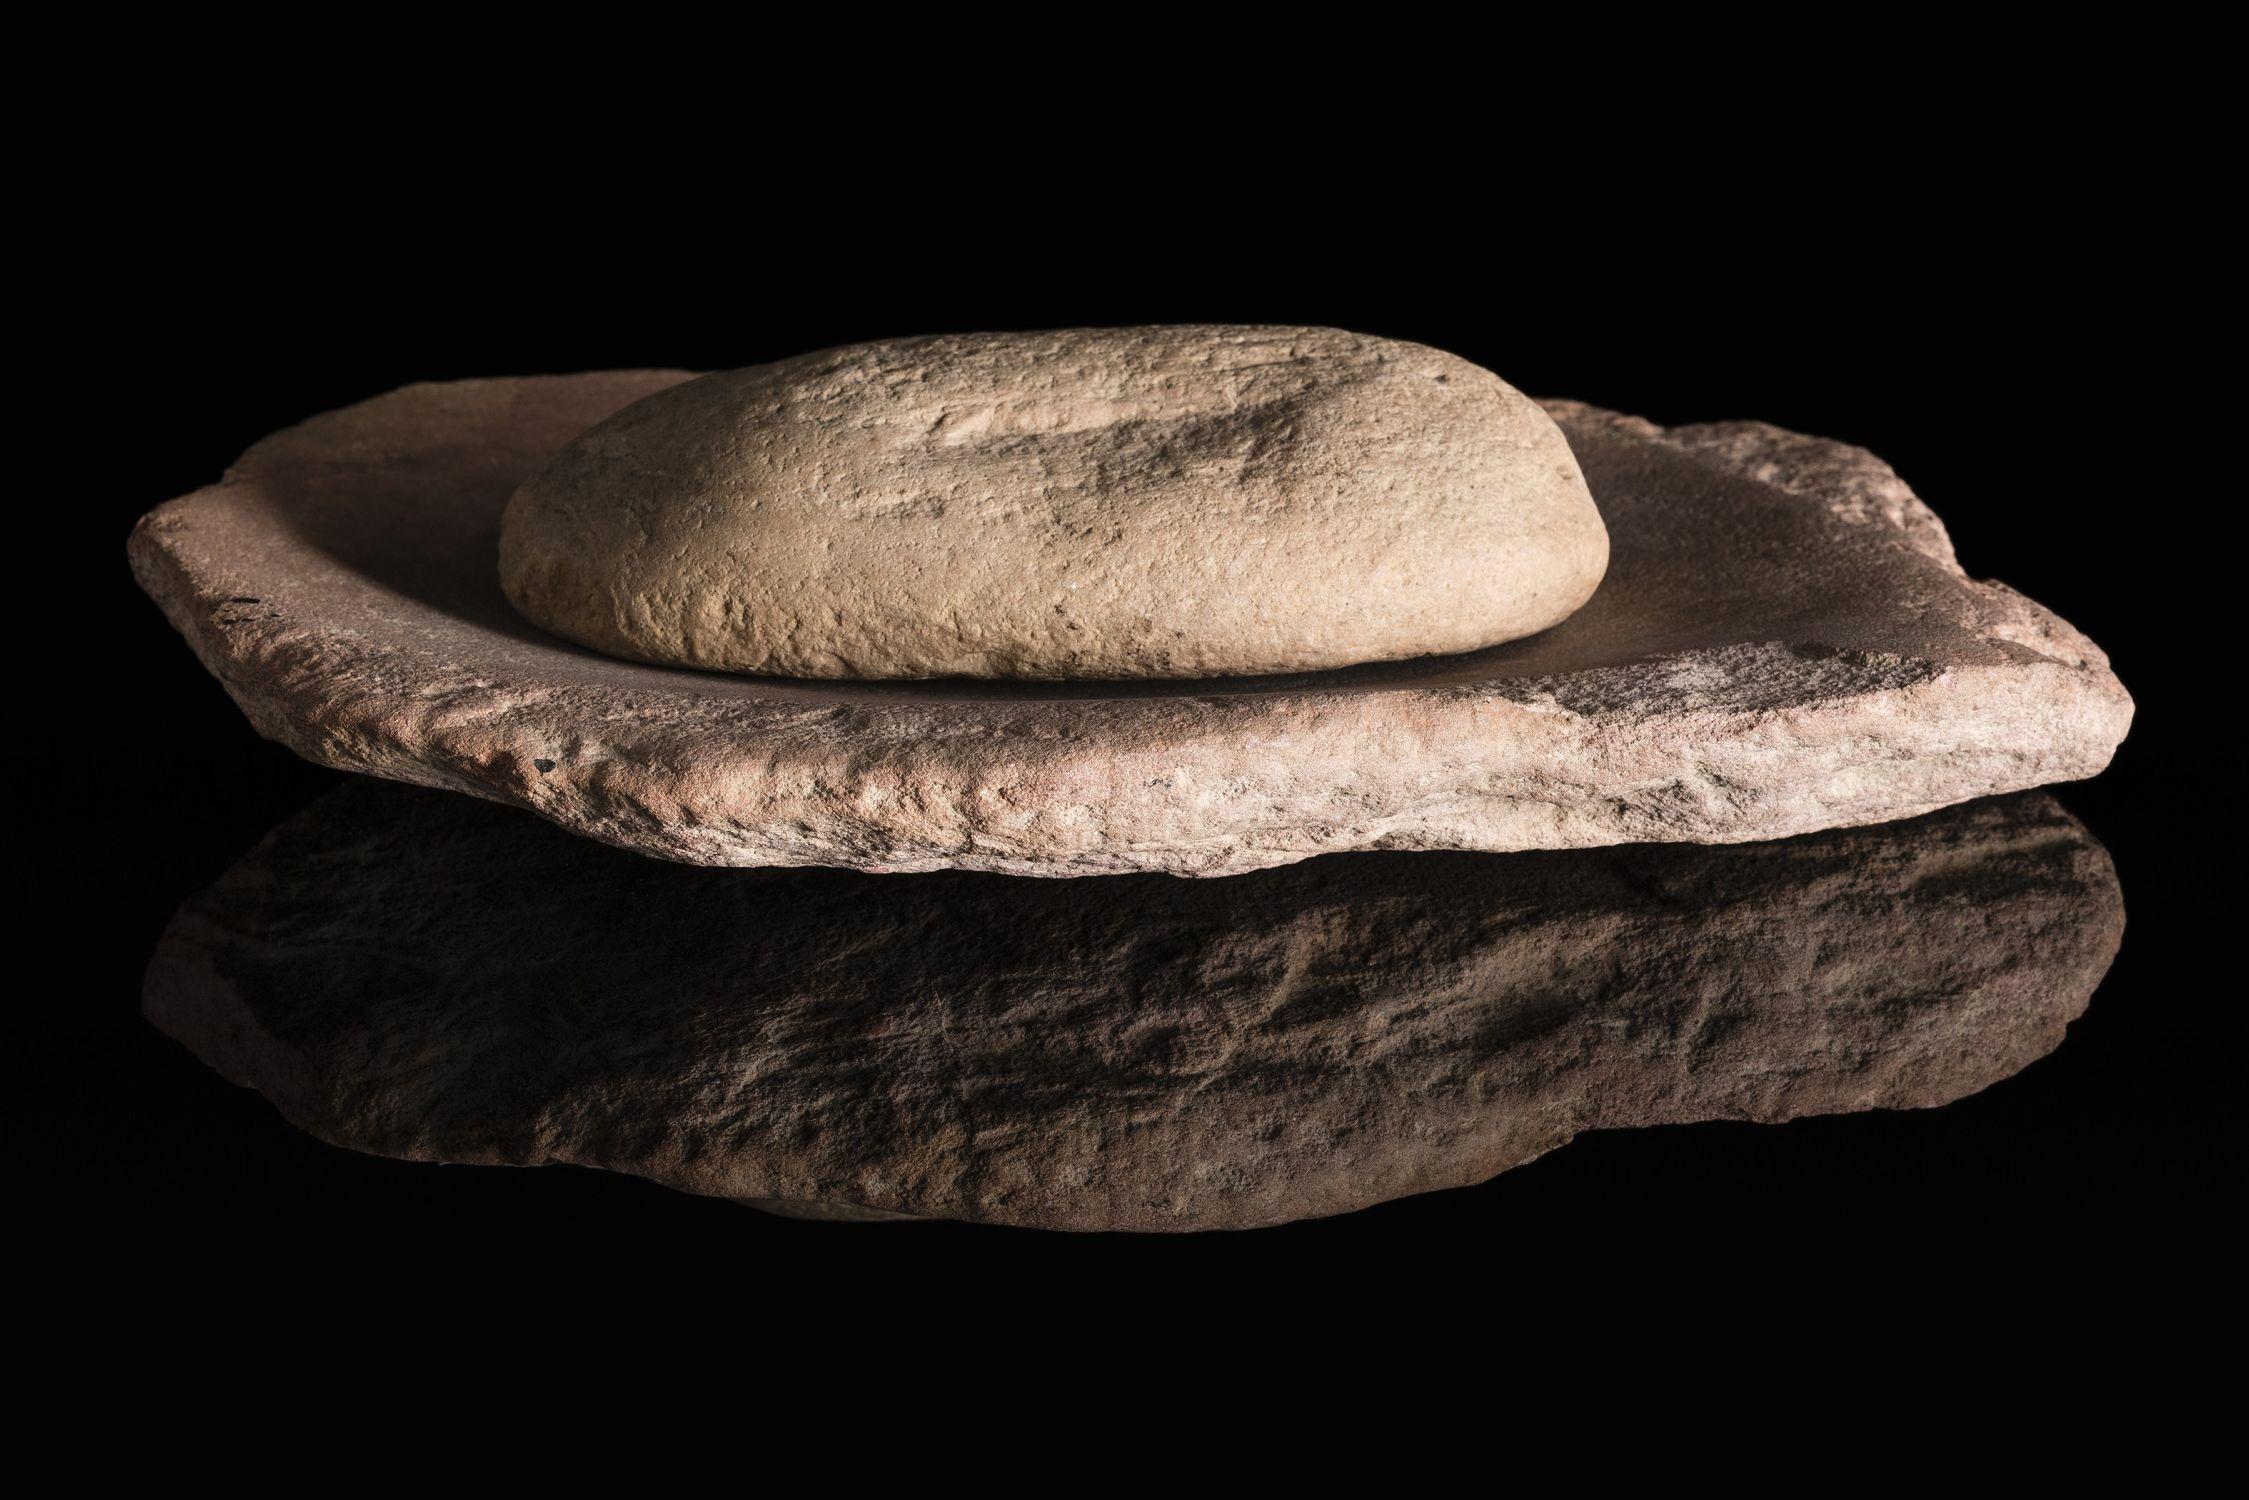 93/36/1 Grindstone and mill, stone, Australia, c. 1900